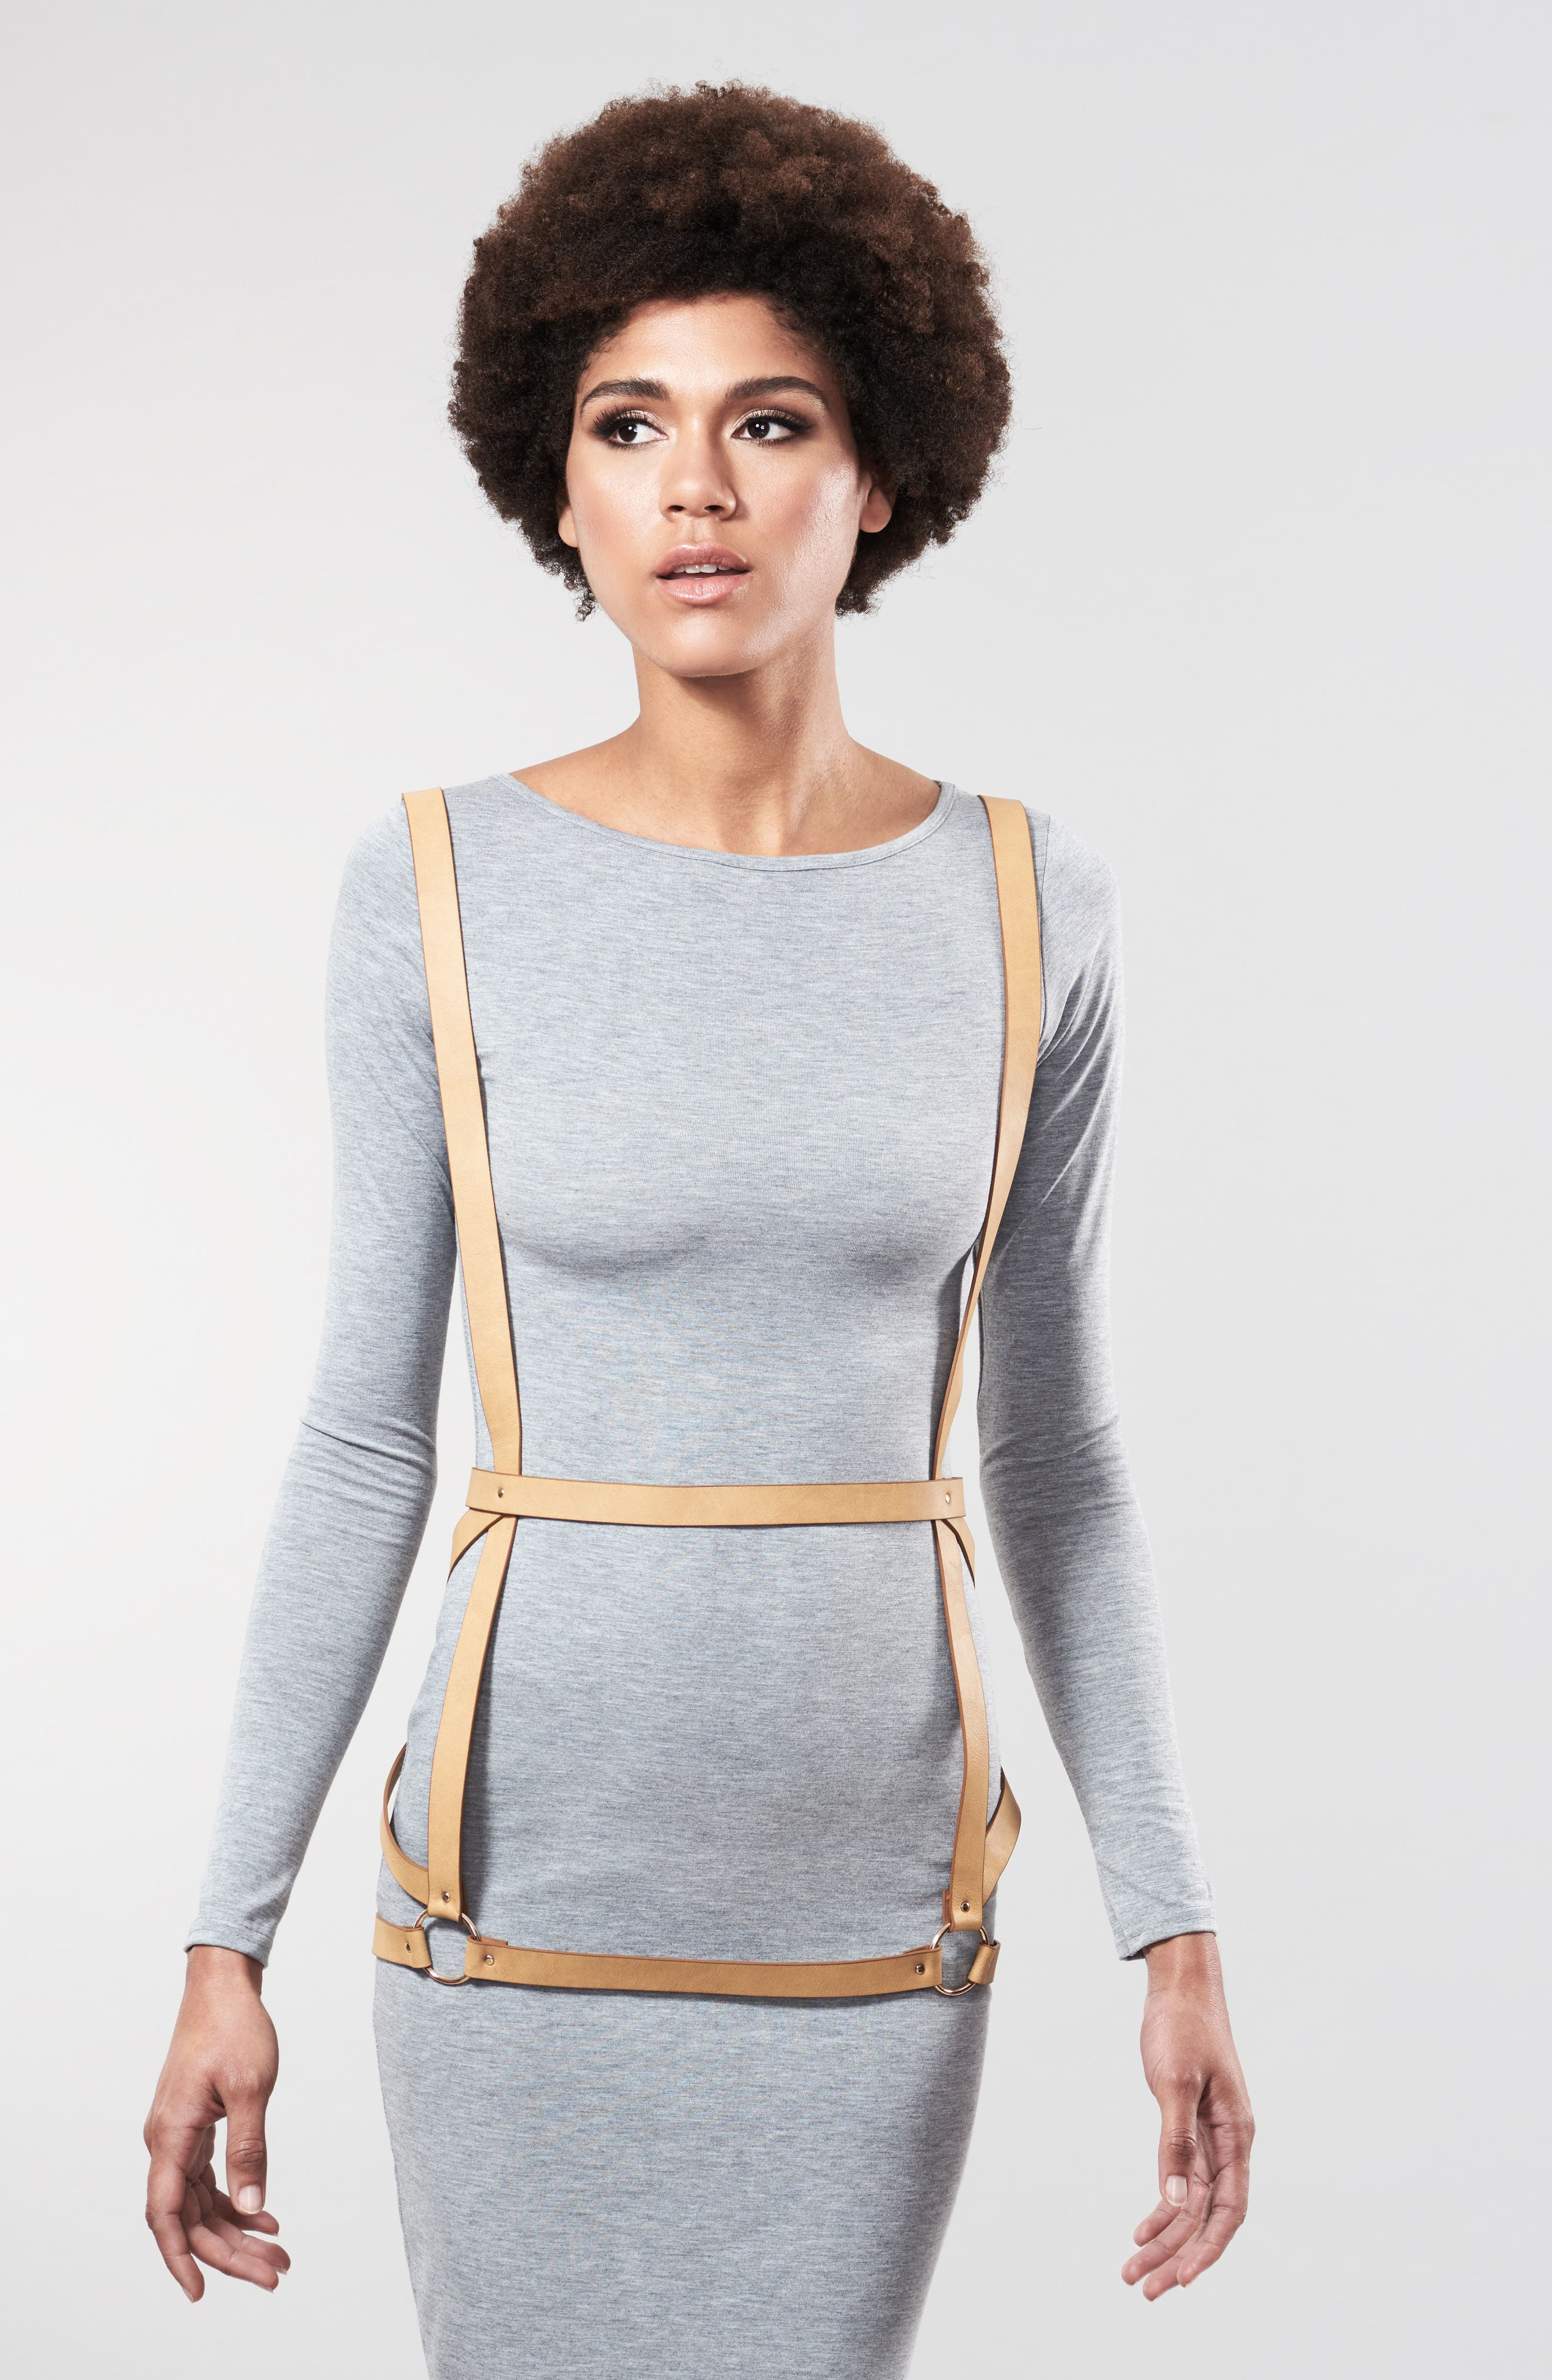 Maze Arrow Dress Harness,                             Alternate thumbnail 8, color,